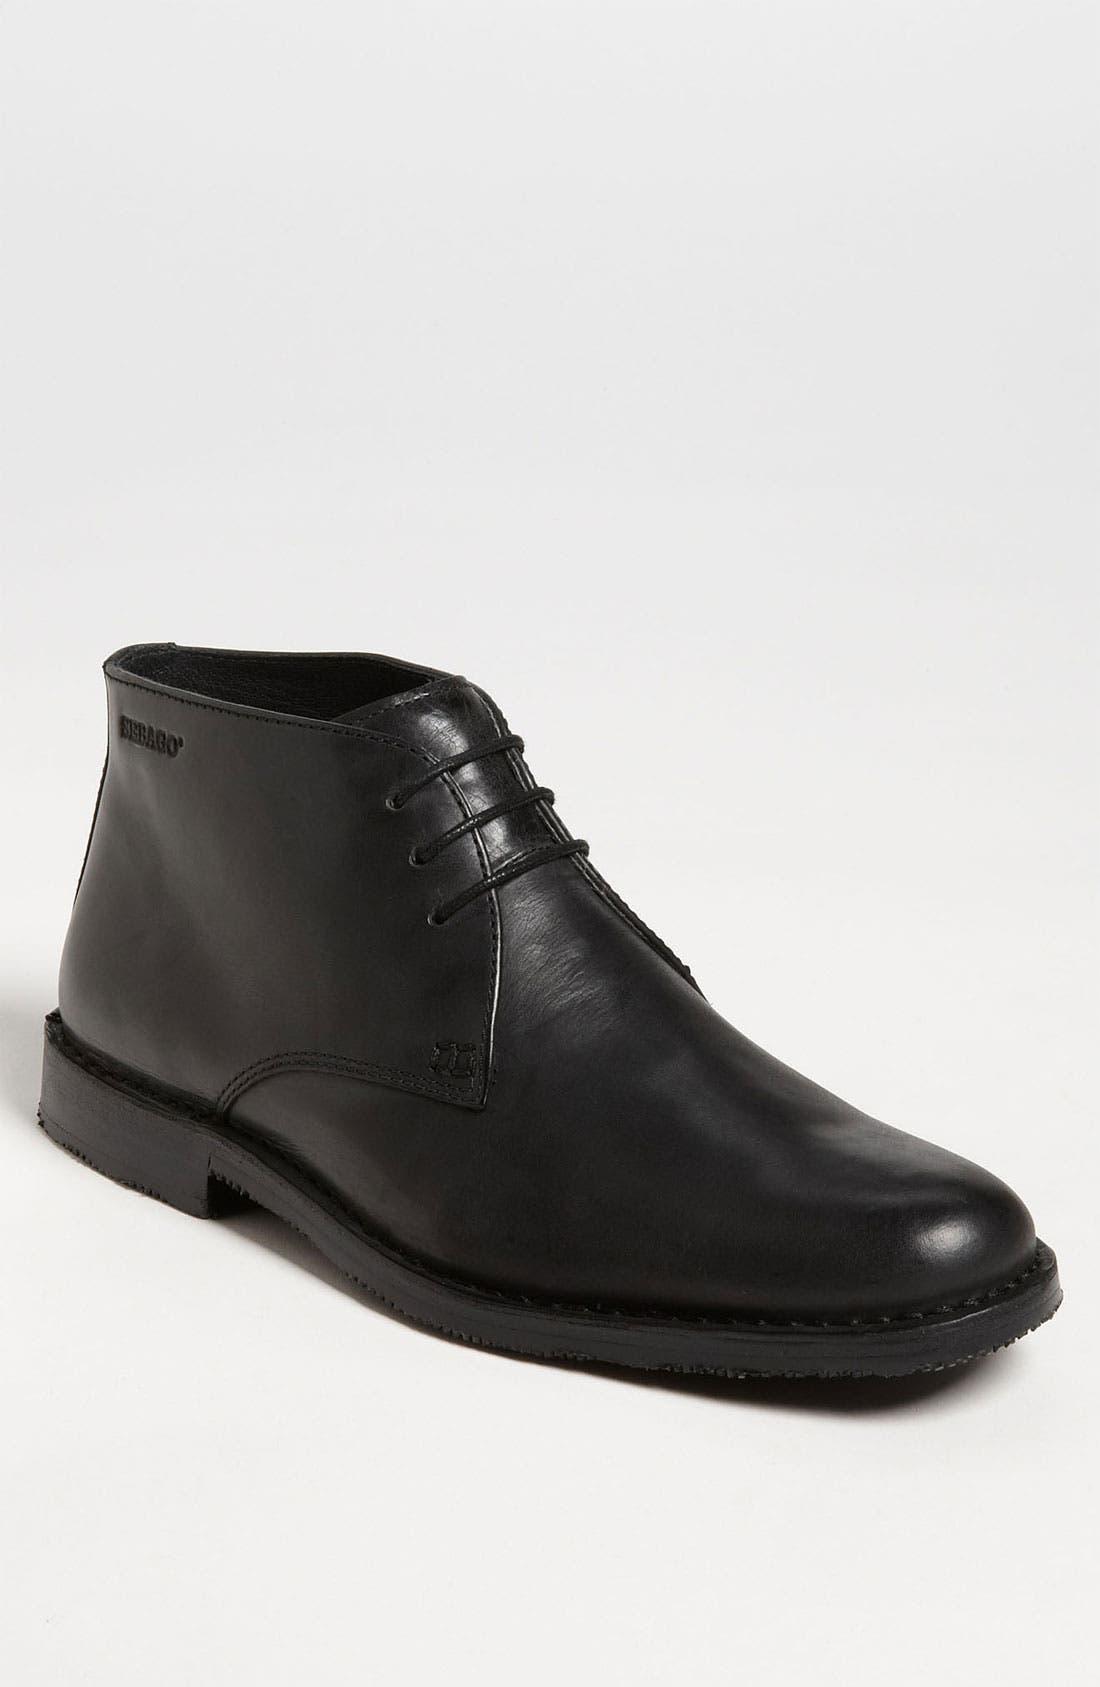 Alternate Image 1 Selected - Sebago 'Tremont' Chukka Boot